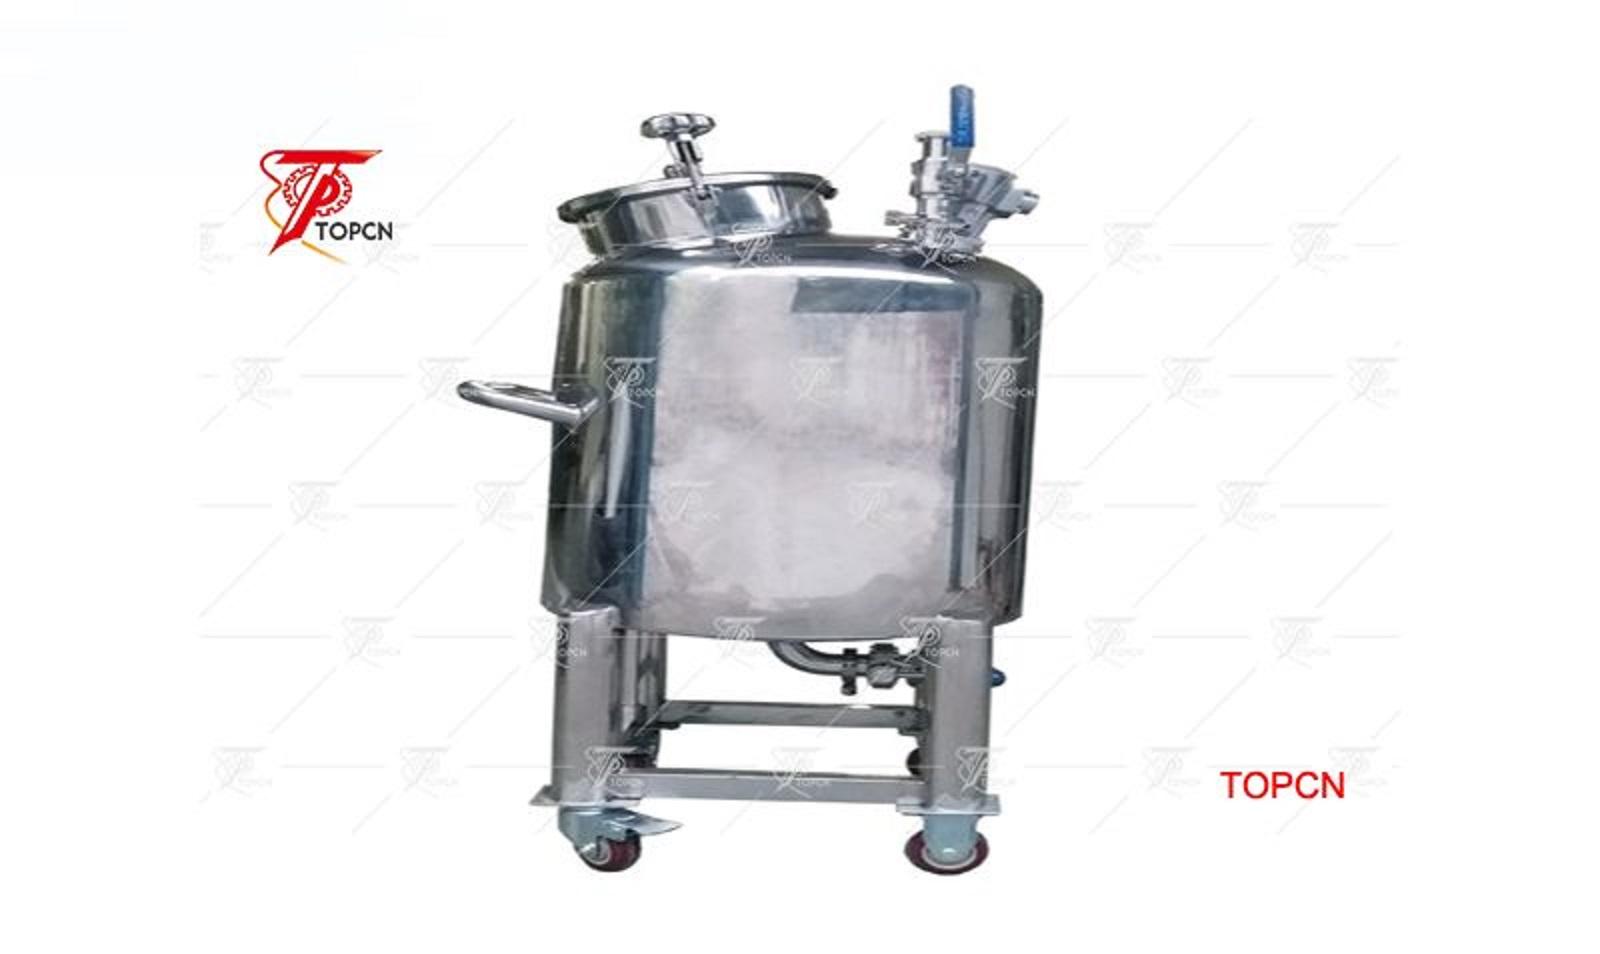 Top Close Essential Oil Perfume Tank